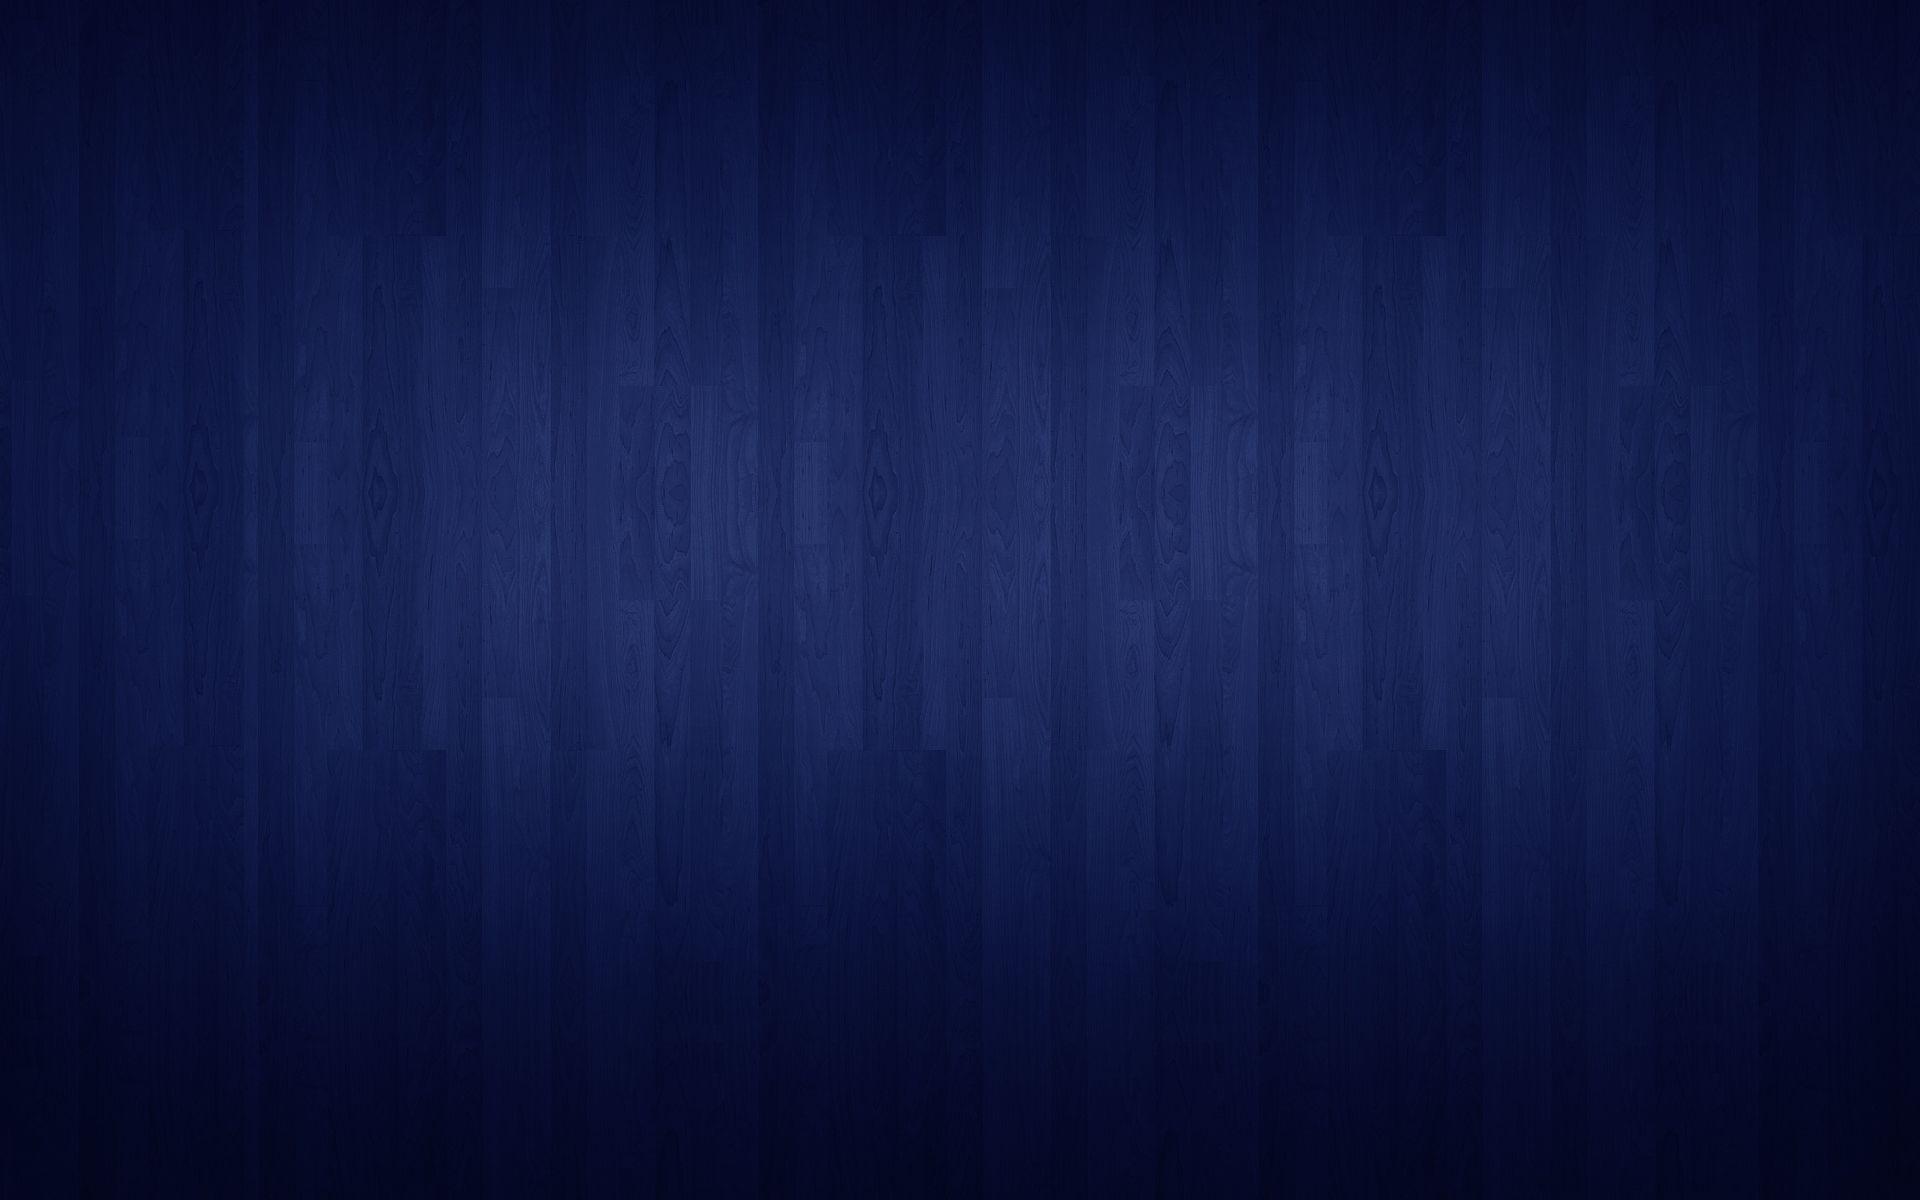 Best Background Images Navy Blue Navy Blue Backgrounds Wallpaper Cave In Best Backgro Blue Background Wallpapers Dark Blue Wallpaper Blue Background Images